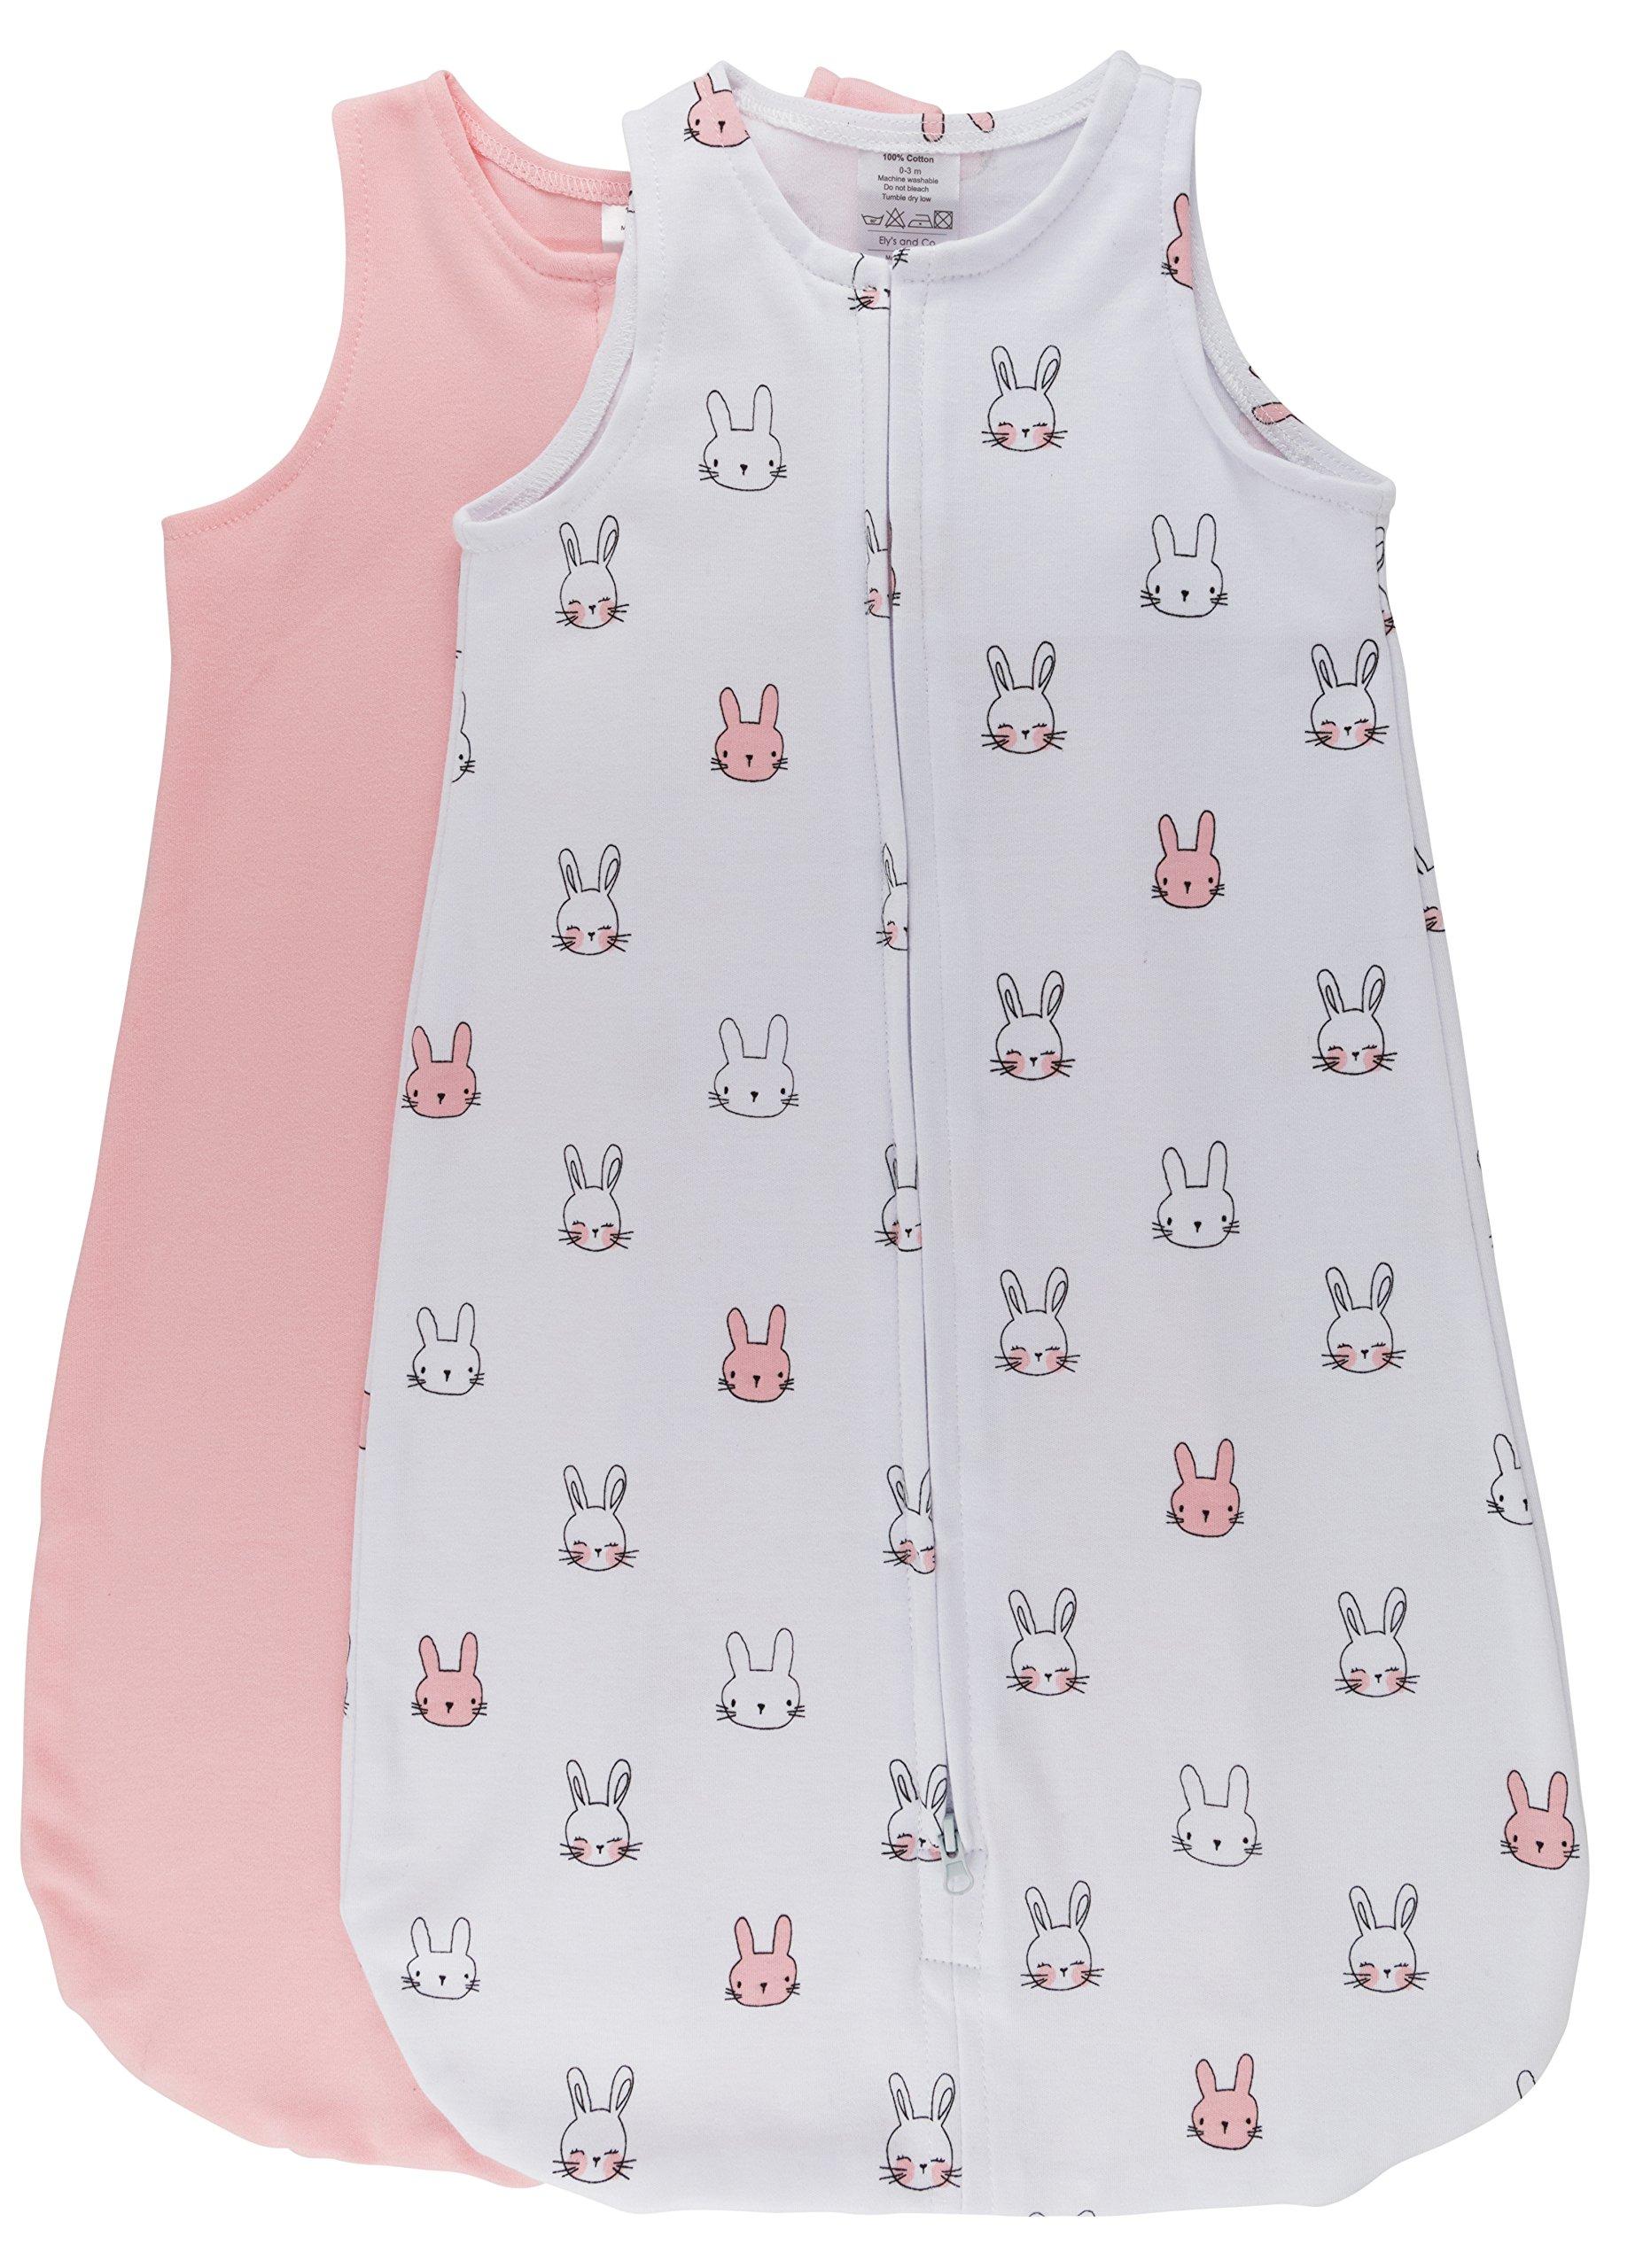 100% Cotton Wearable Blanket Baby Sleep Bag Pink Bunnies 2 Pack (0-3 Months)